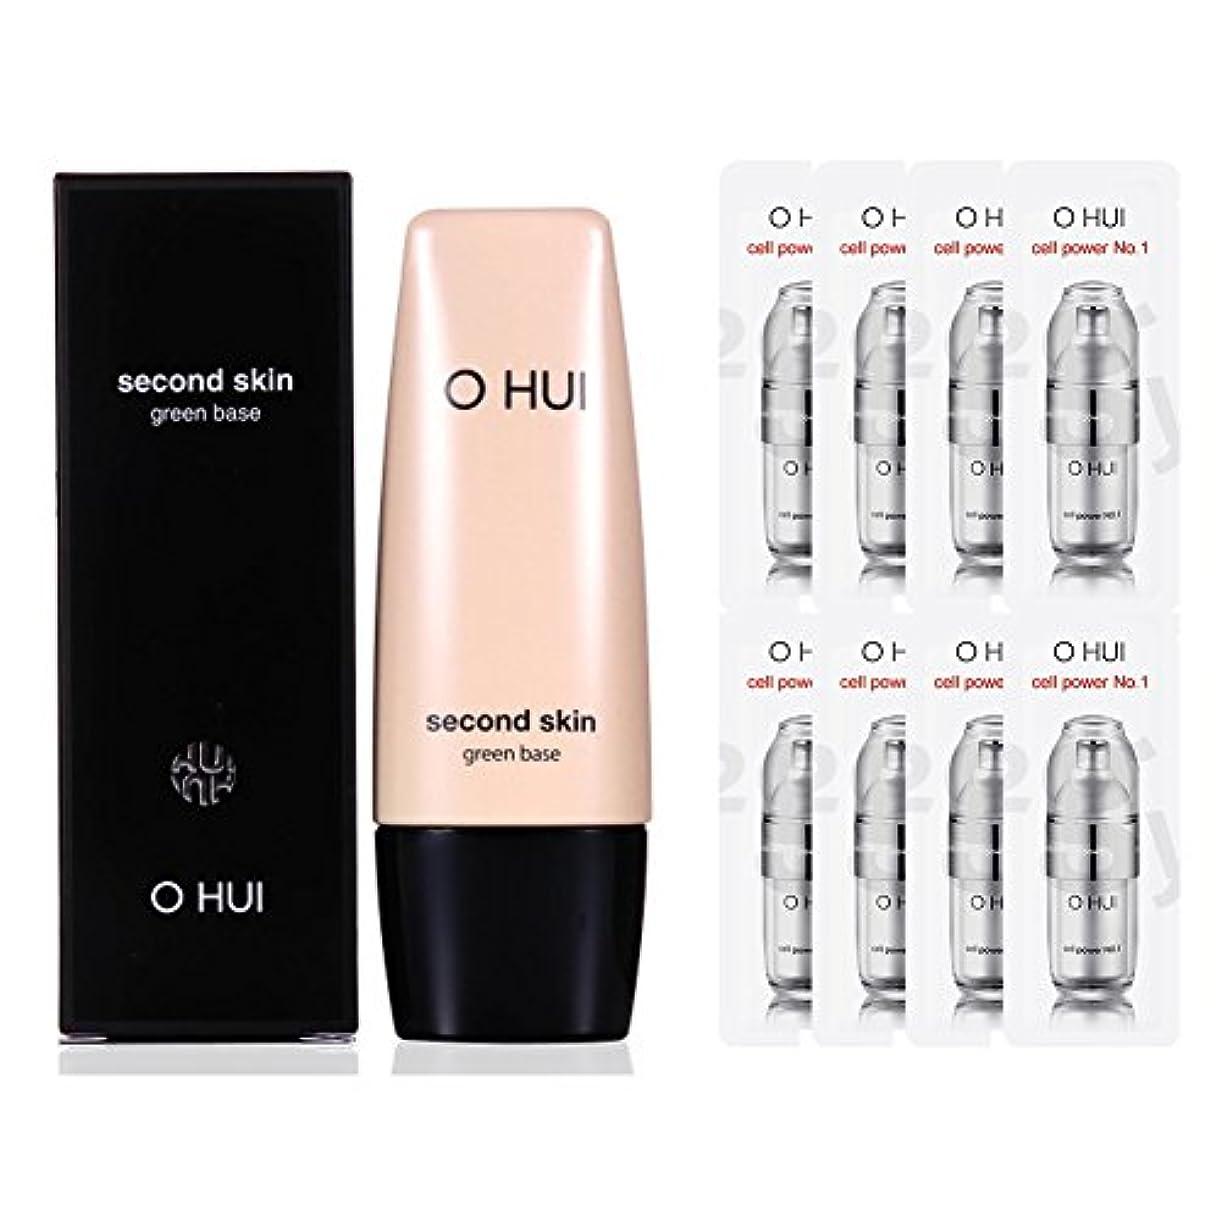 OHUI/オフィセカンドスキン グリーンベース (メイクアップベース) (OHUI SECOND SKIN GREEN BASE Makeup Base set) スポット [海外直送品]